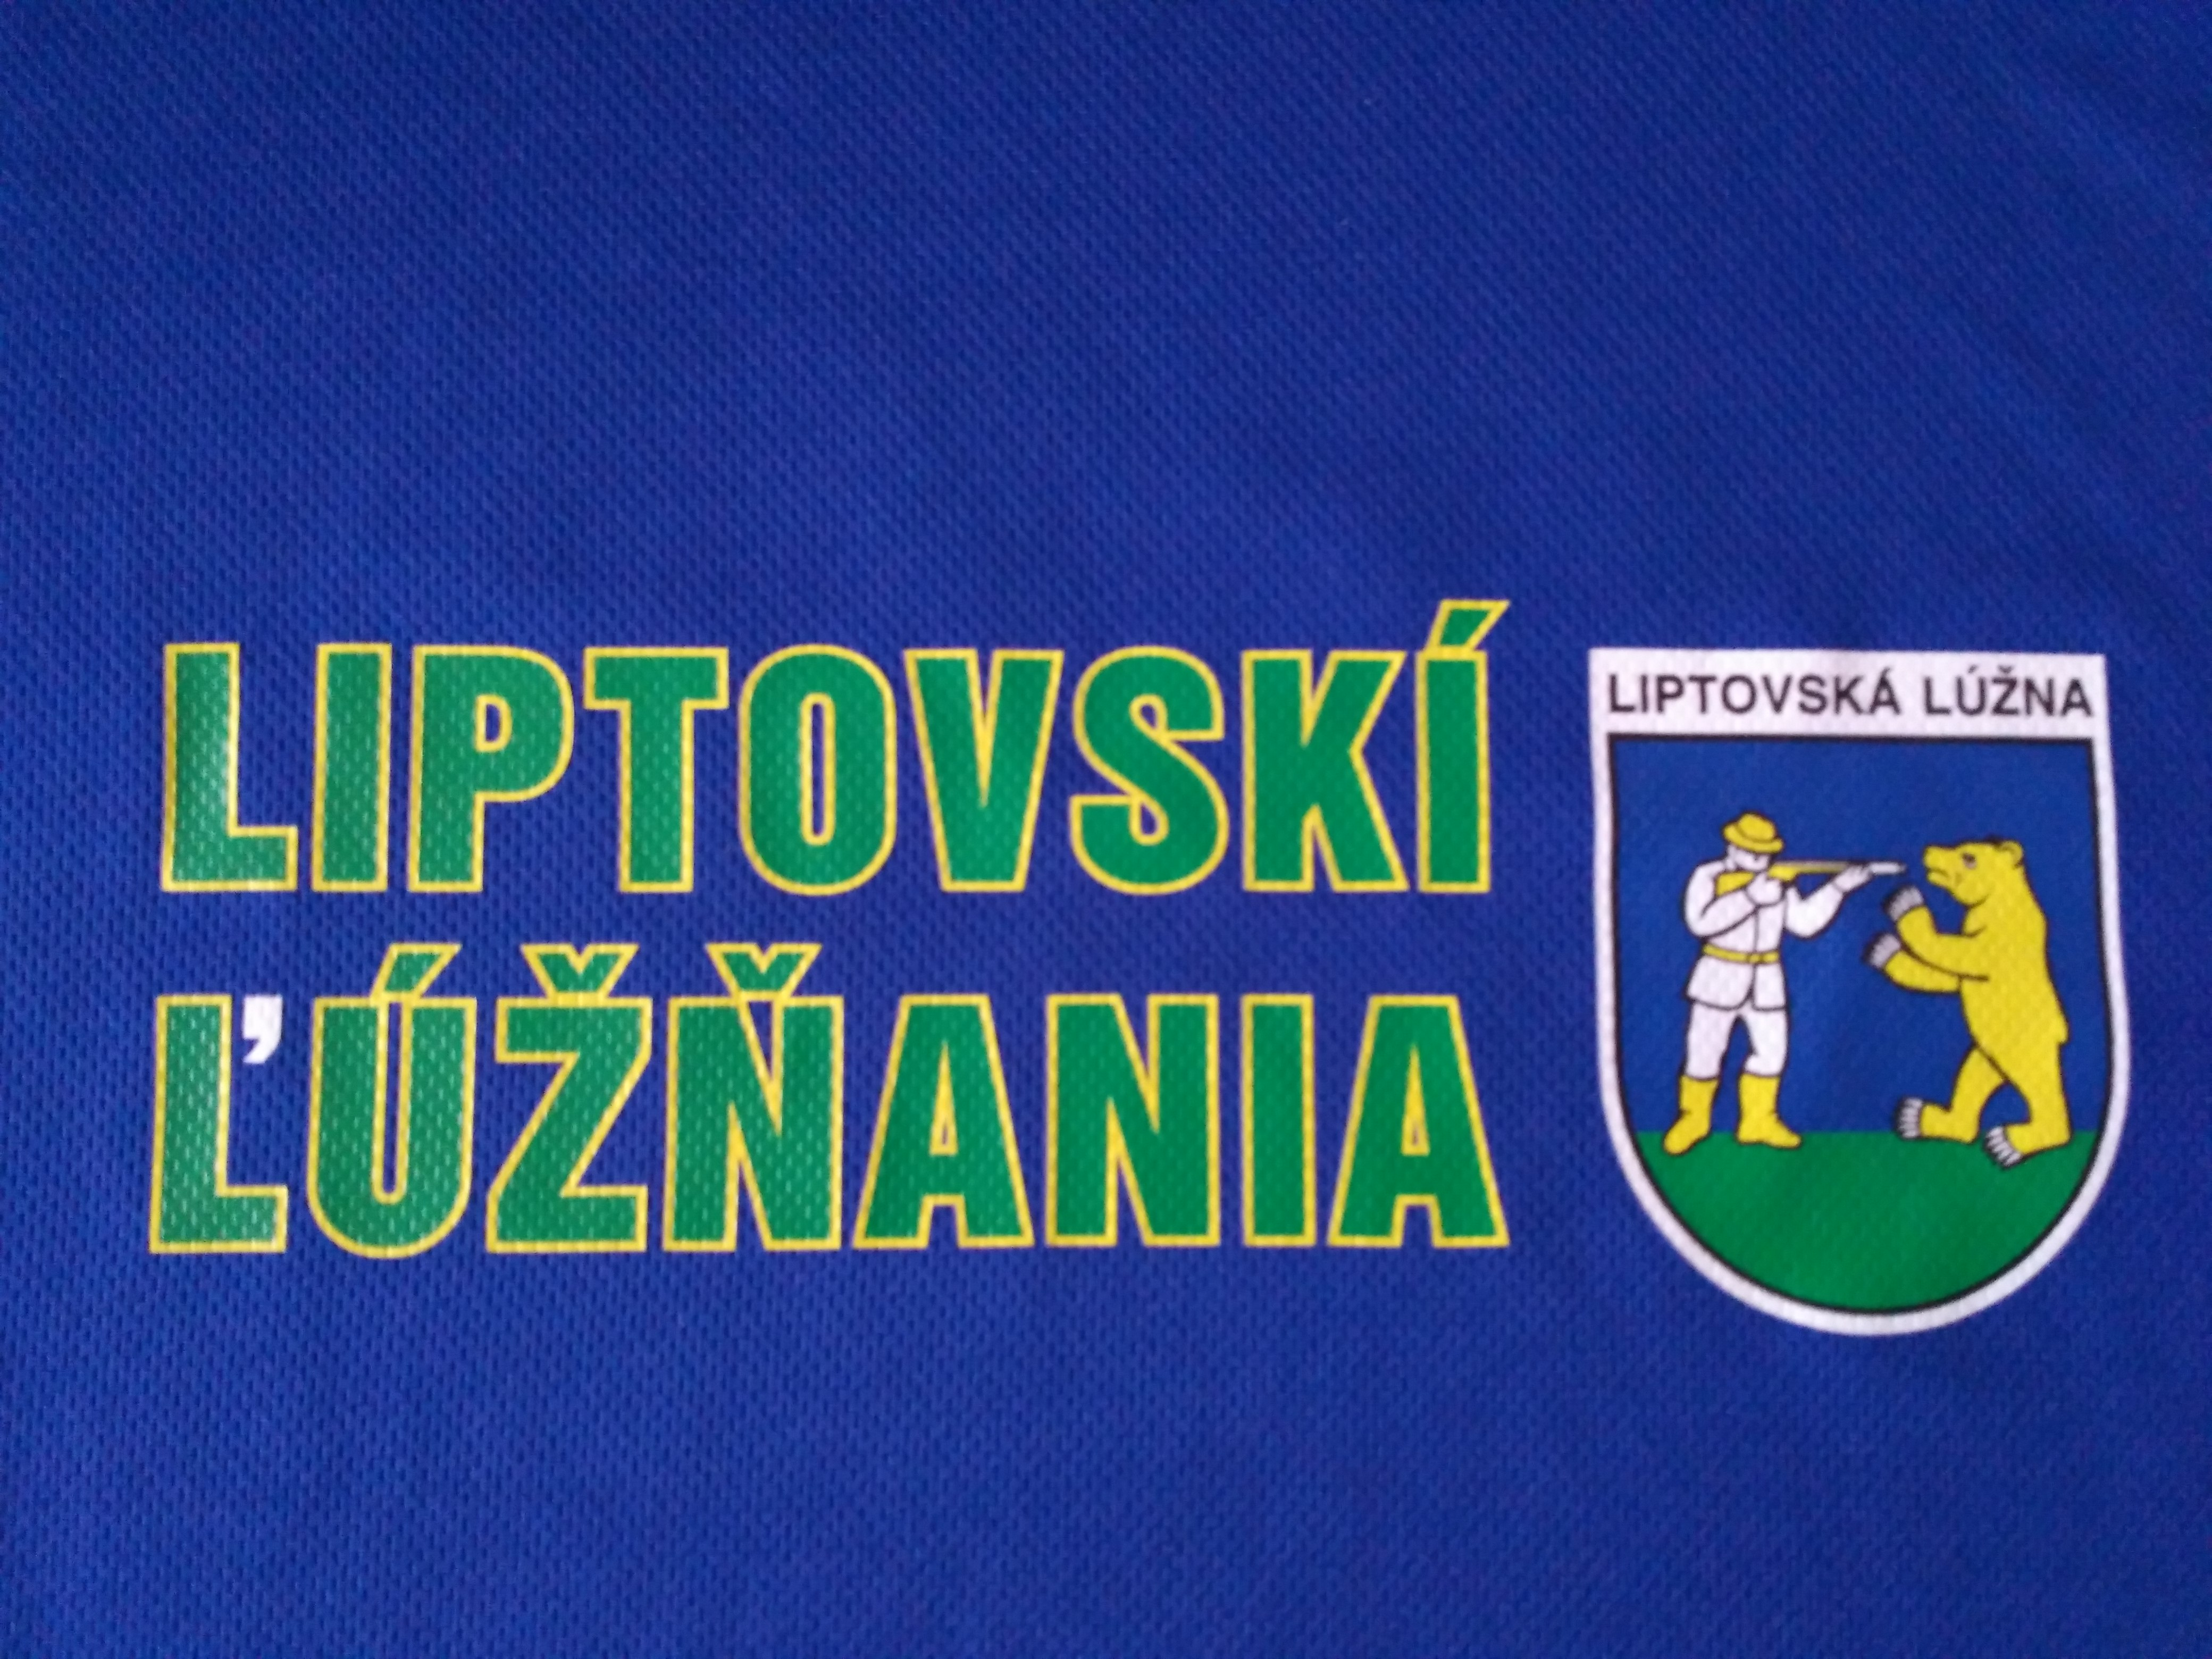 /images/com_odtatierkdunaju/teams/2021_Liptovsk-----------ania.jpg